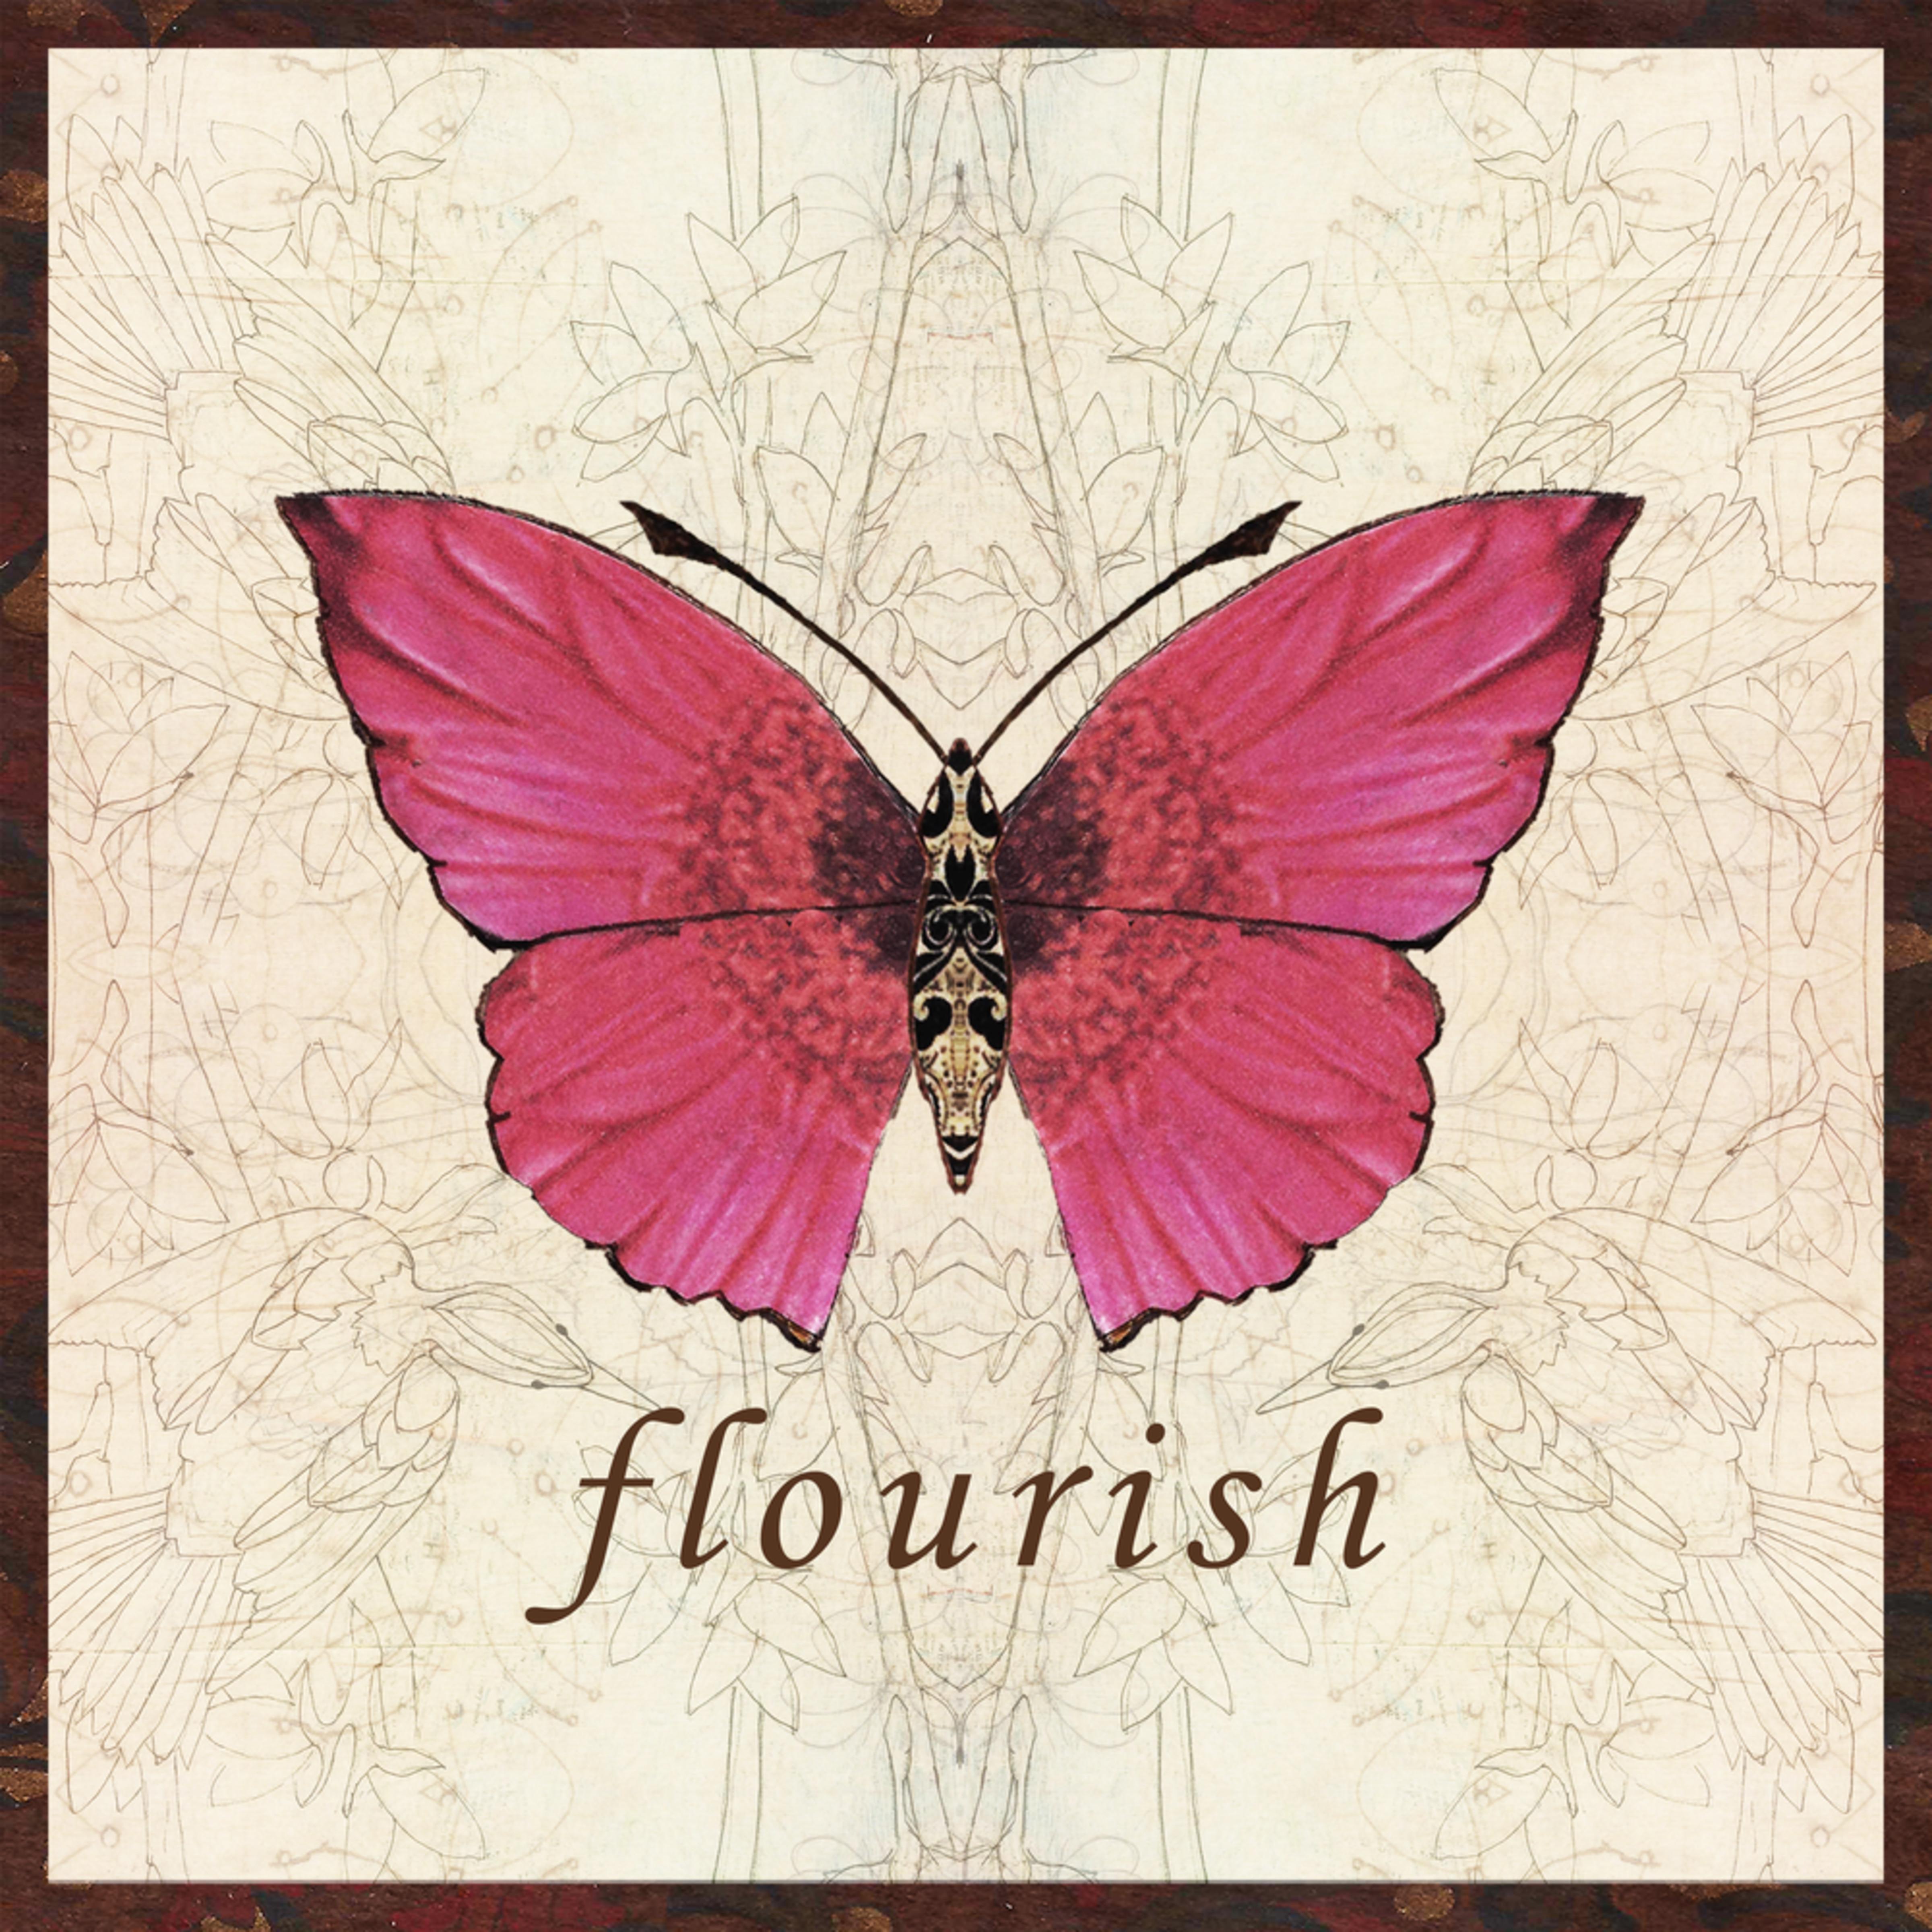 Flourish lvlilx